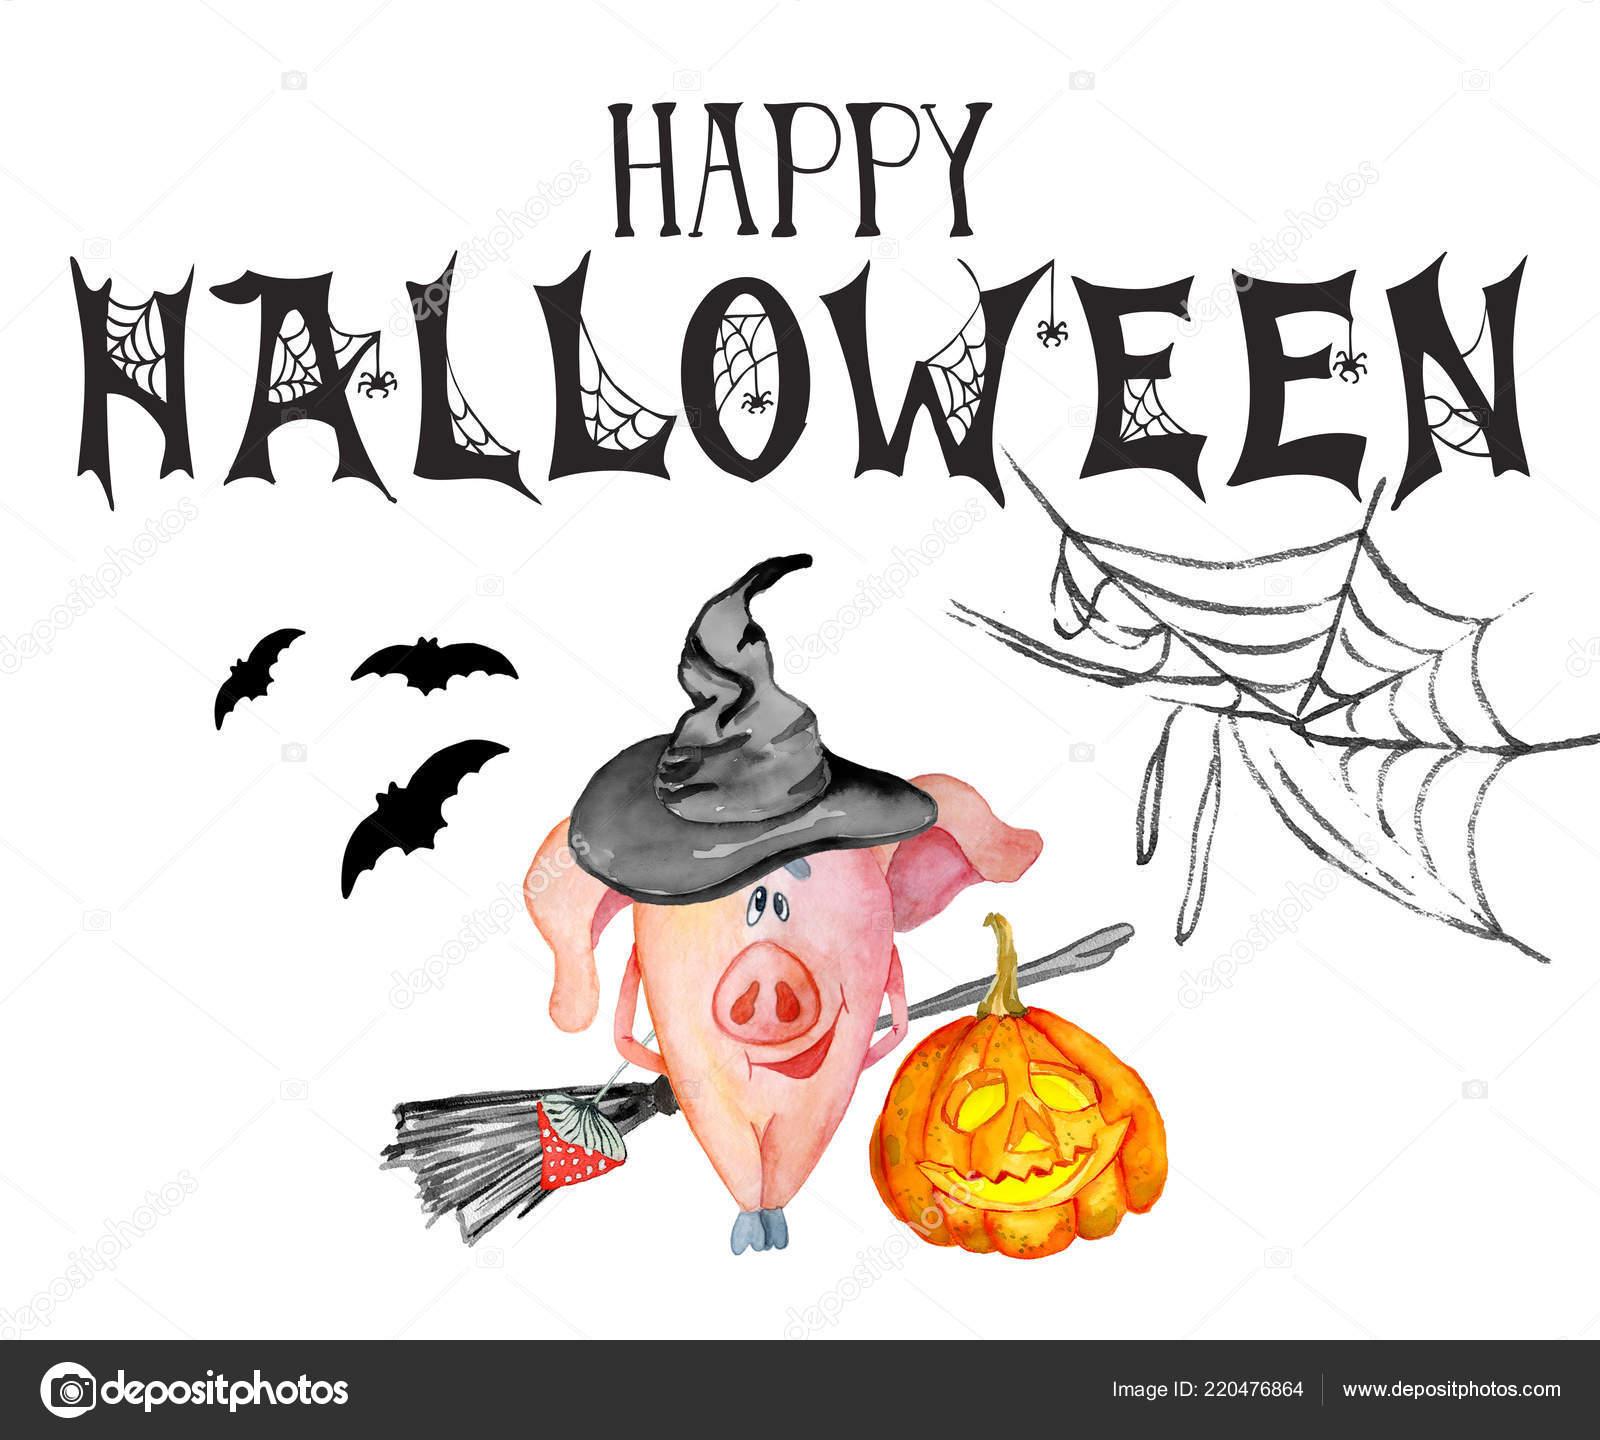 Форум по теме: Хэллоуин в 2019 году